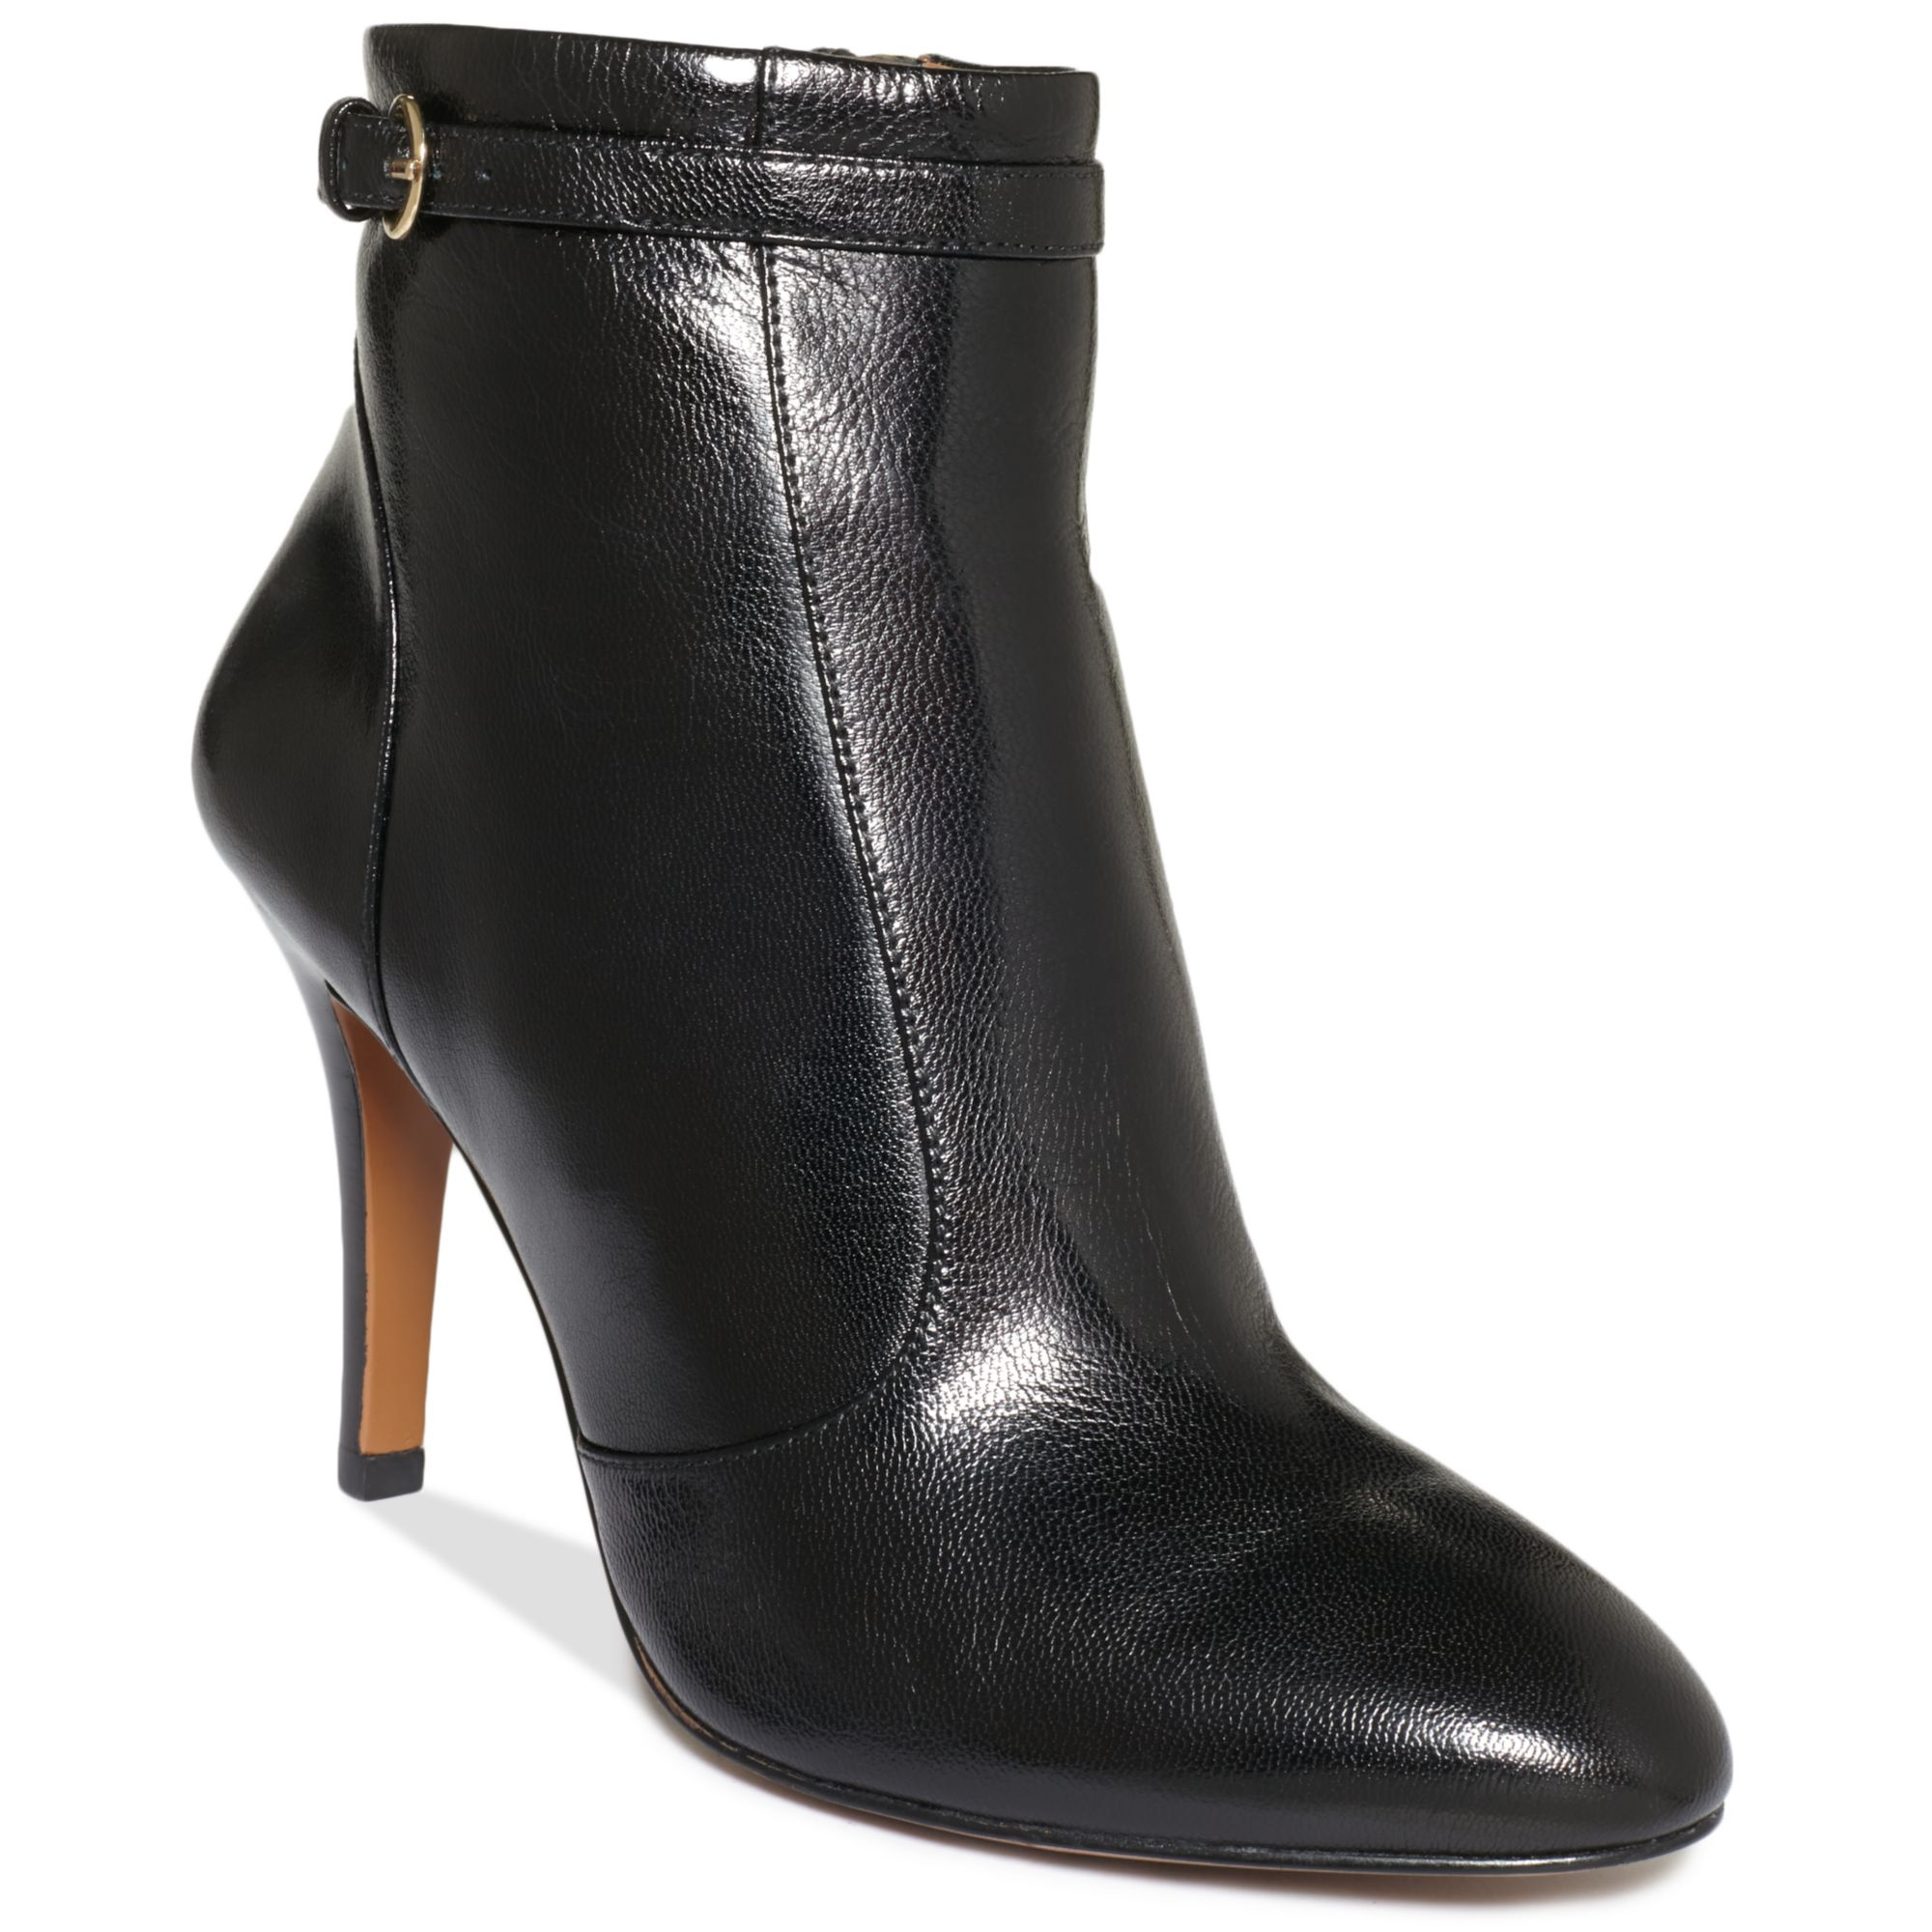 Nine West Kalette Ankle Booties, Black/Black. Quick View $ Was $ $ OFF. Nine West Womens Black Ankle Boots Size Quick View $ 65 - $